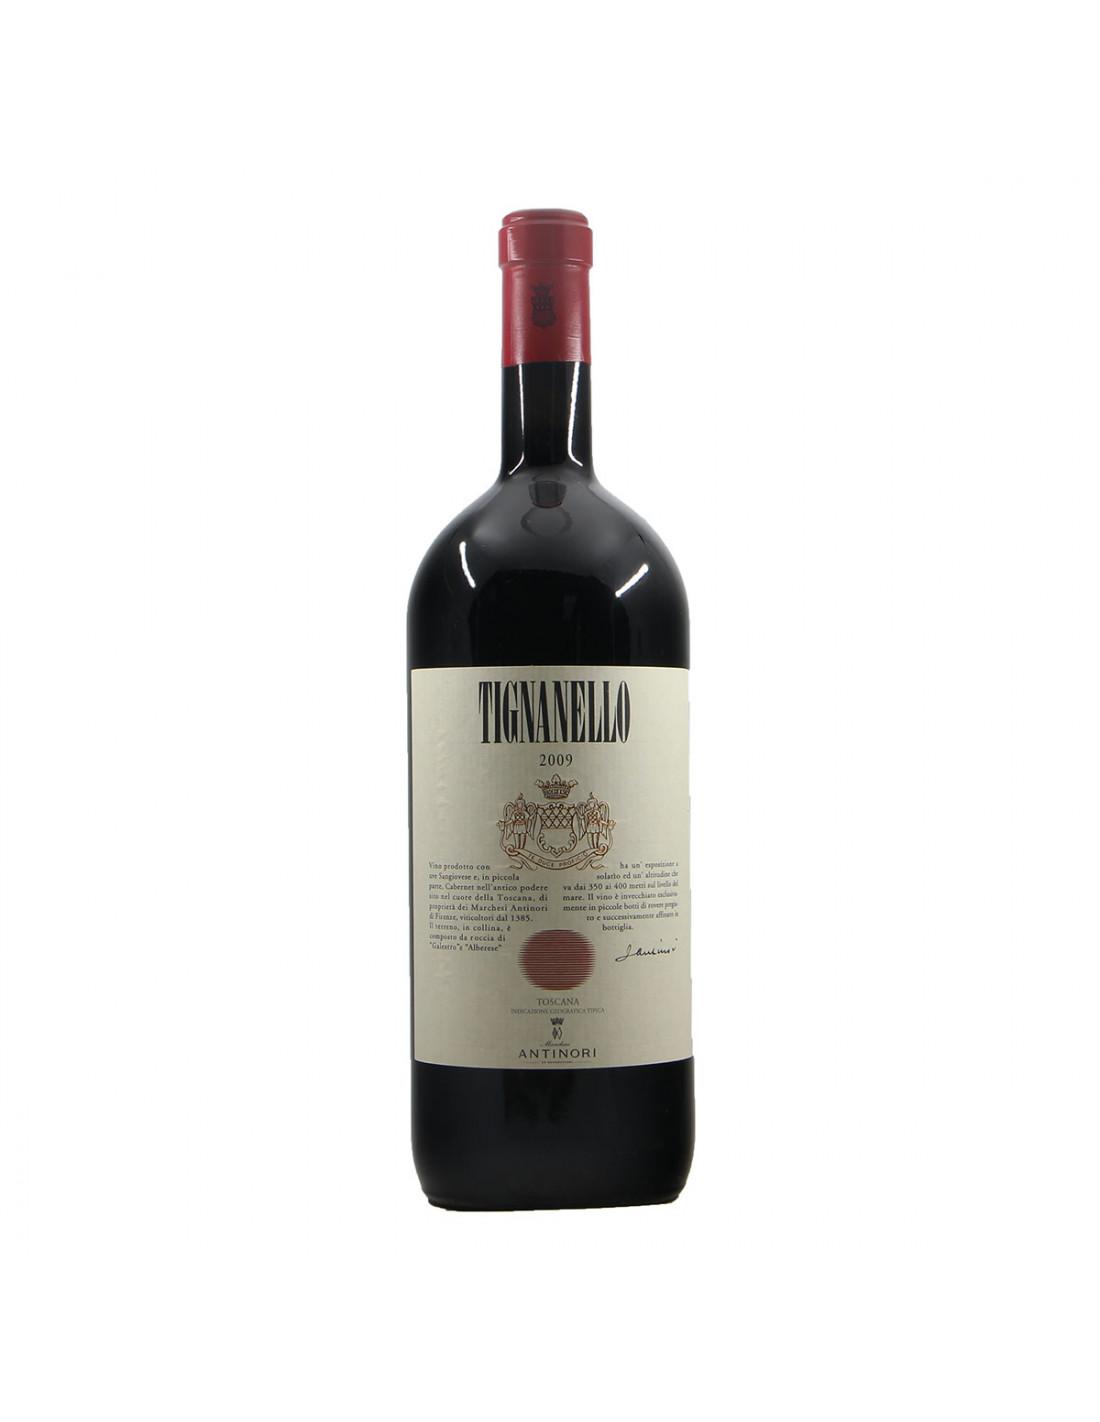 Tignanello 2009 Antinori Grandi Bottiglie